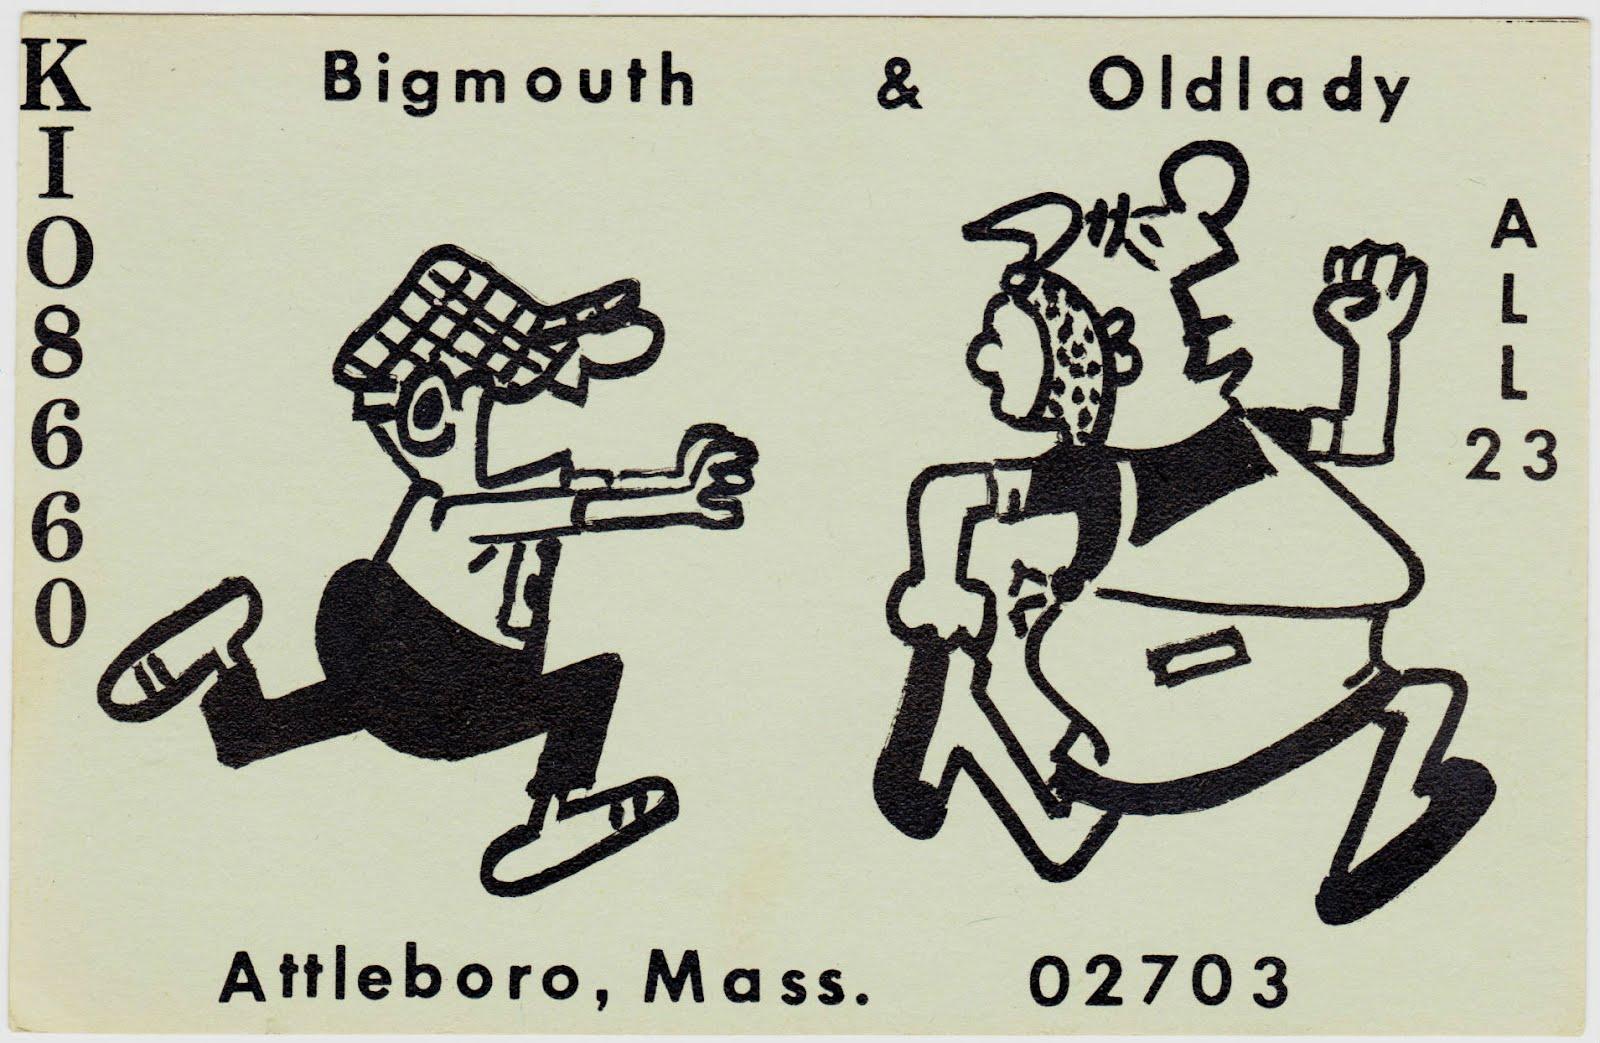 attleboro-mass-strip-club